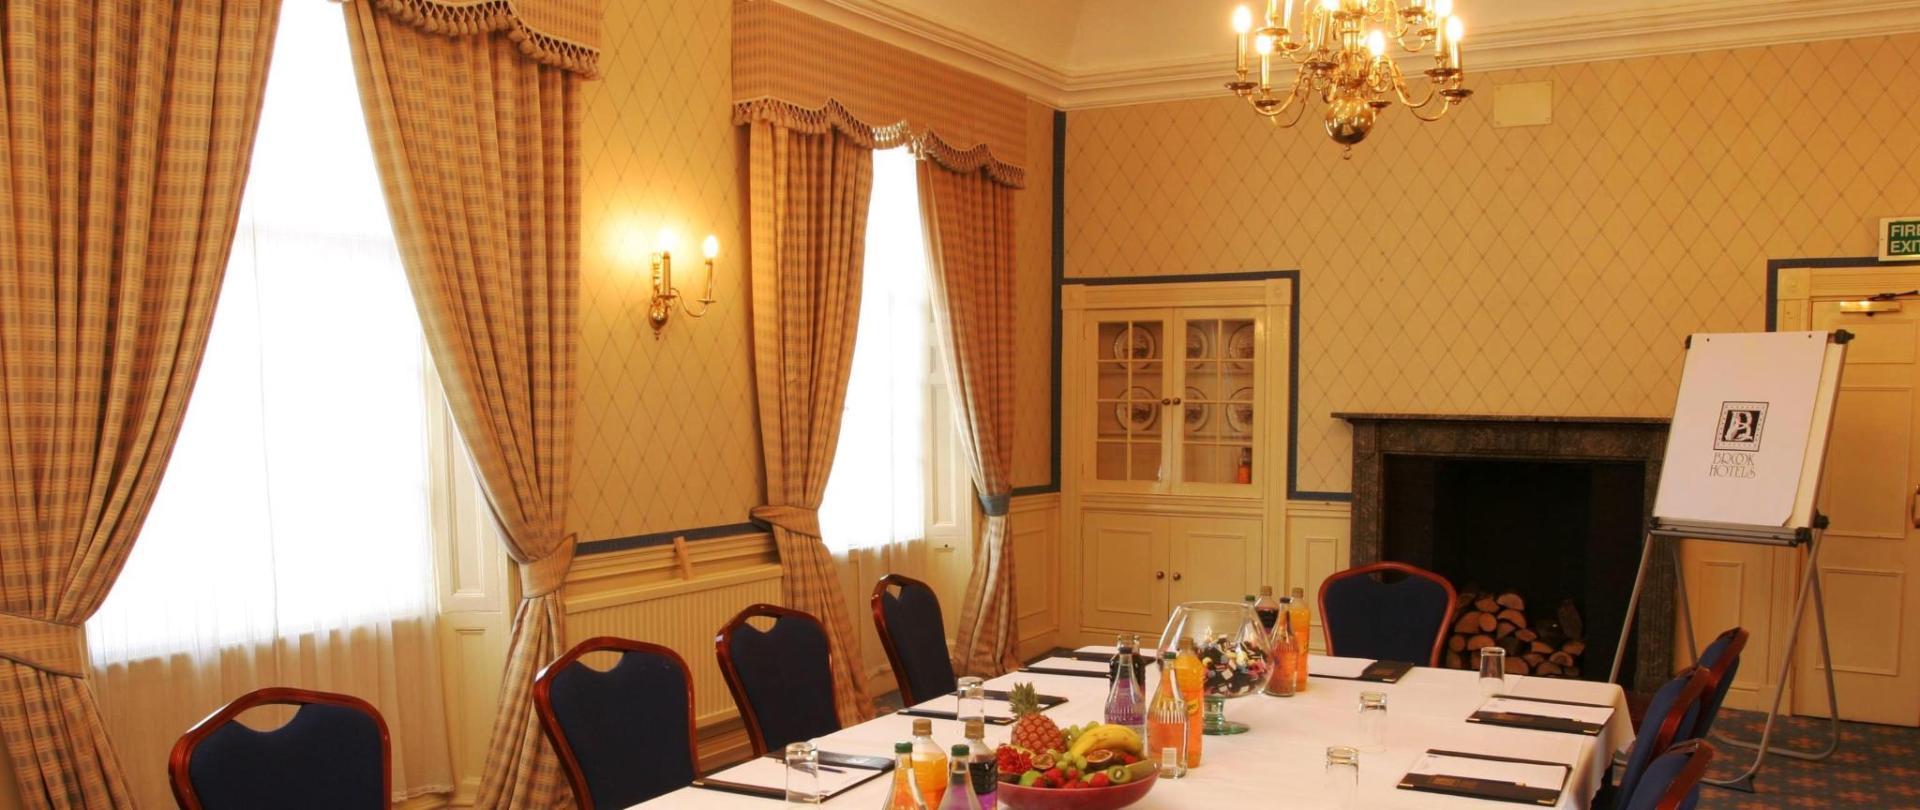 conference room - whipper.JPG